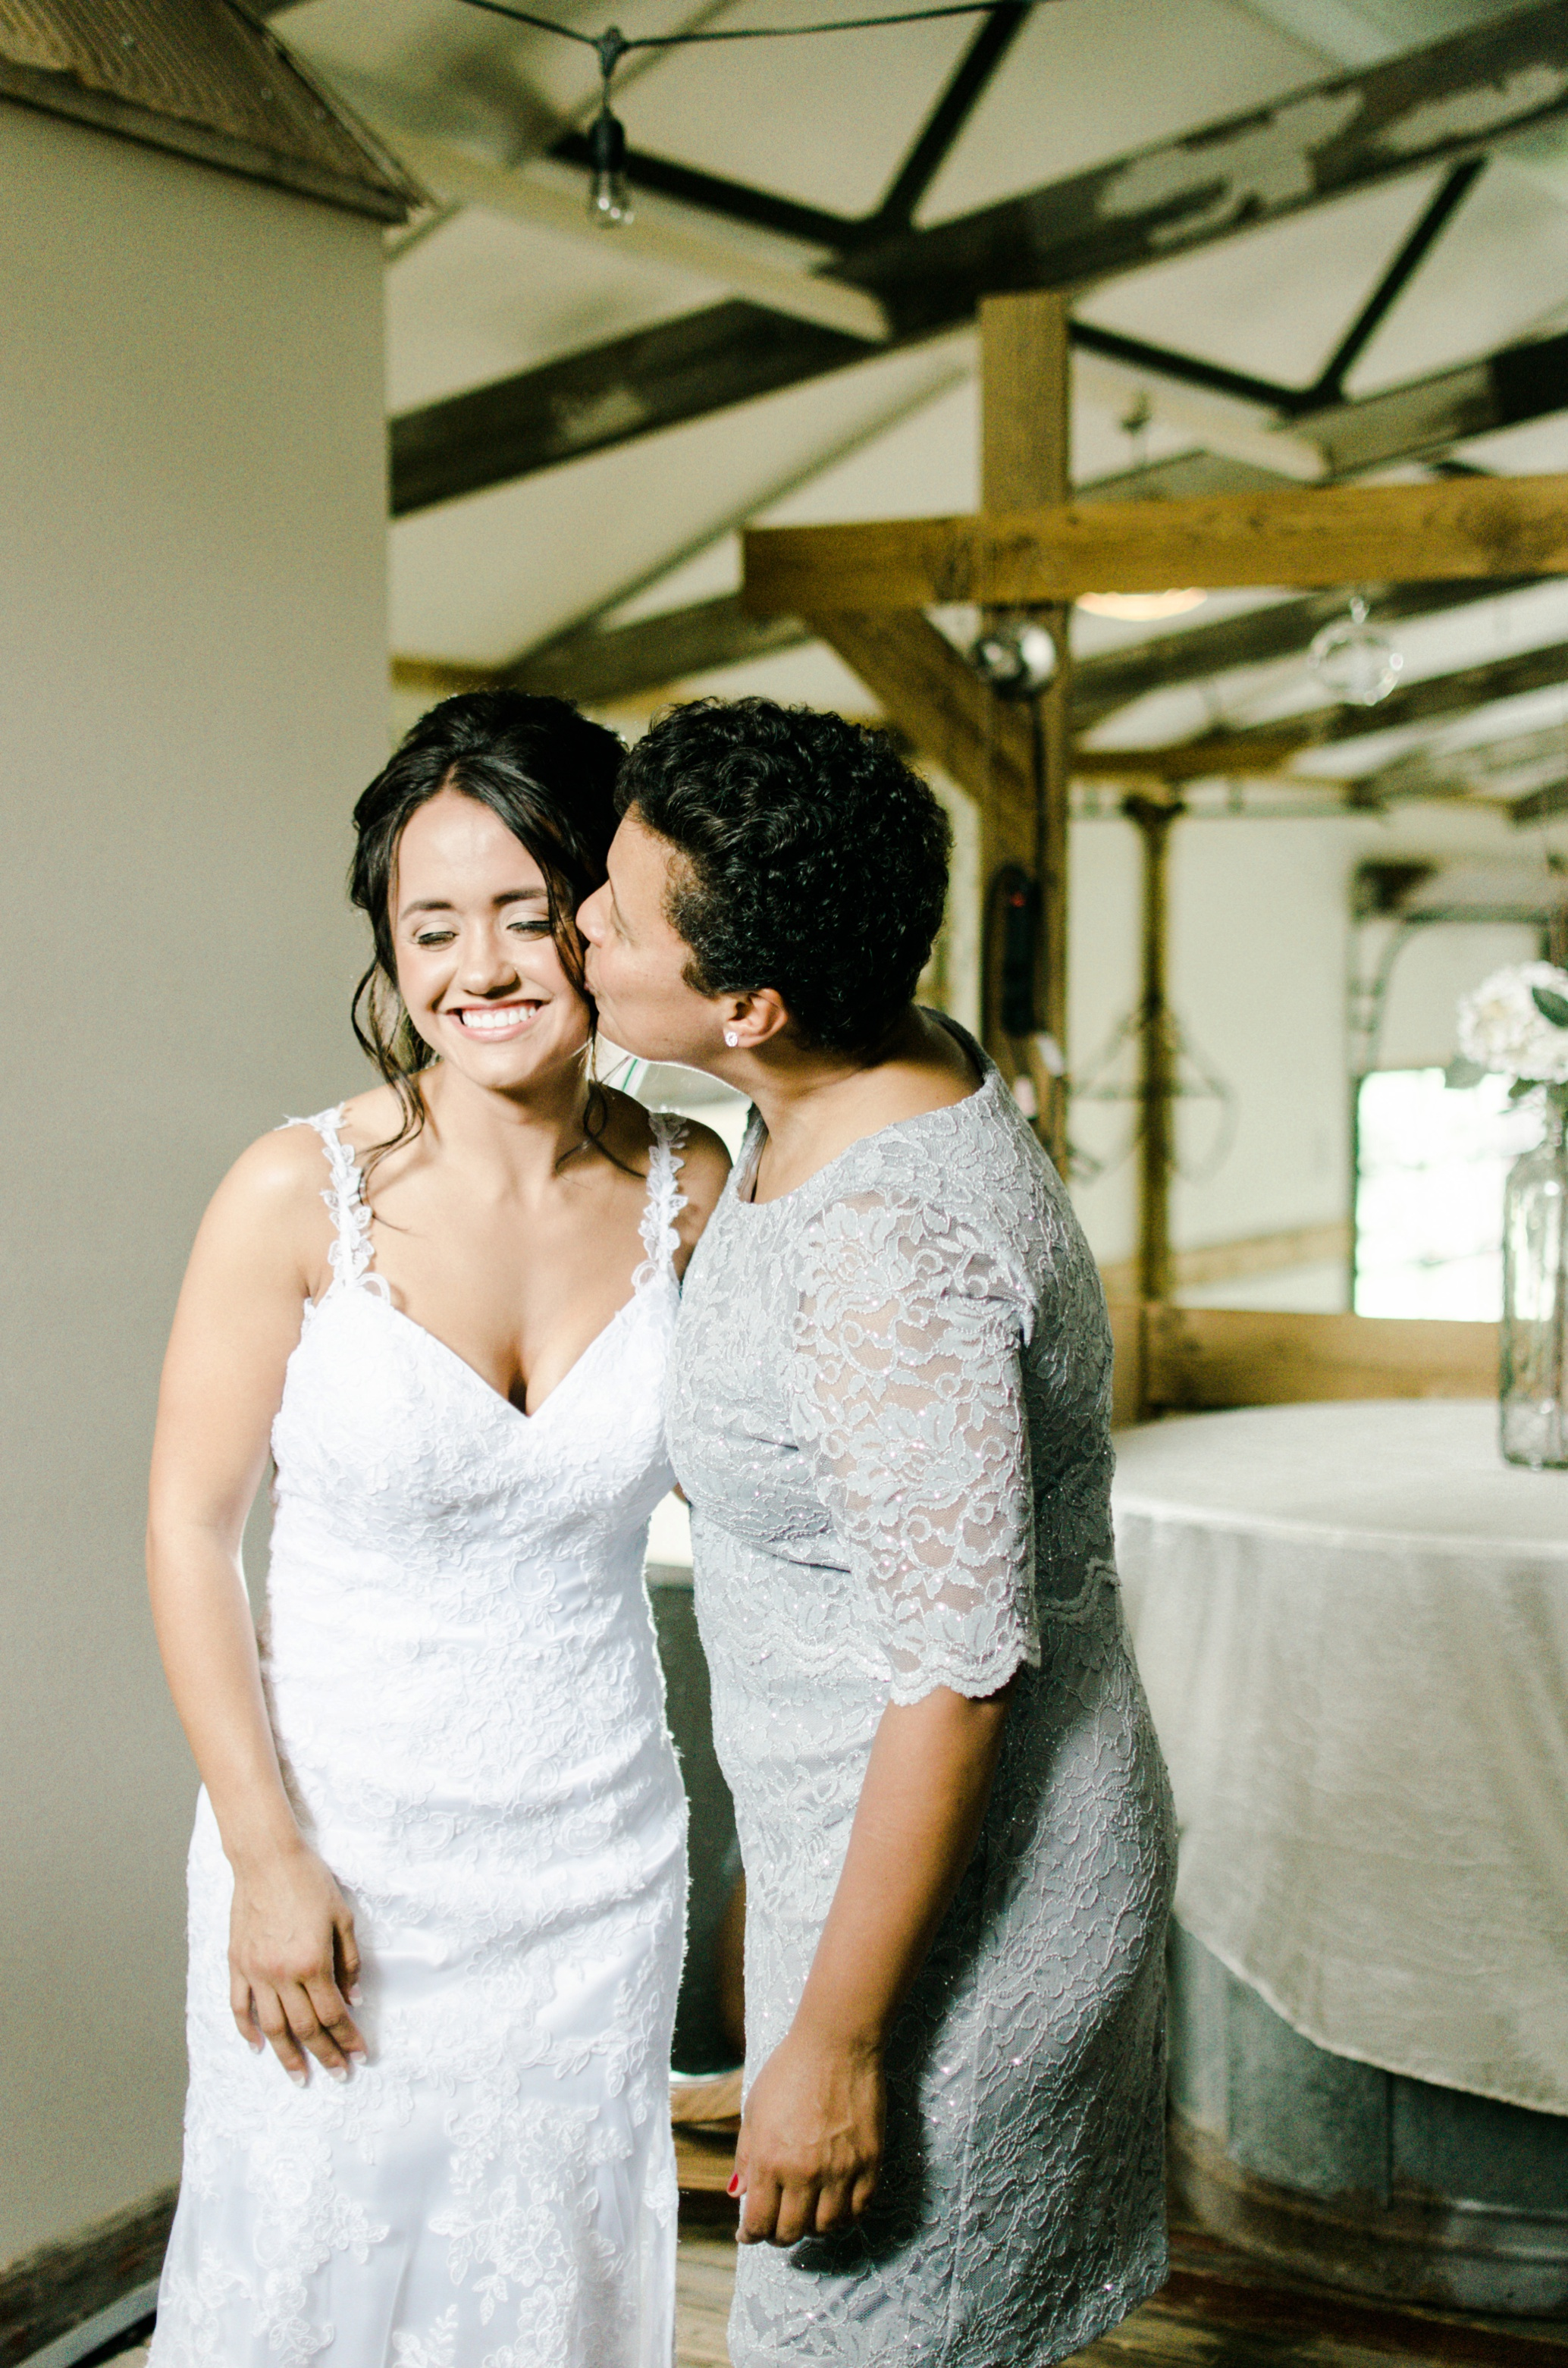 Barnes' Place Rustic Outdoor Wedding | Ali Leigh Photo Minneapolis Wedding Photographer_0097.jpg